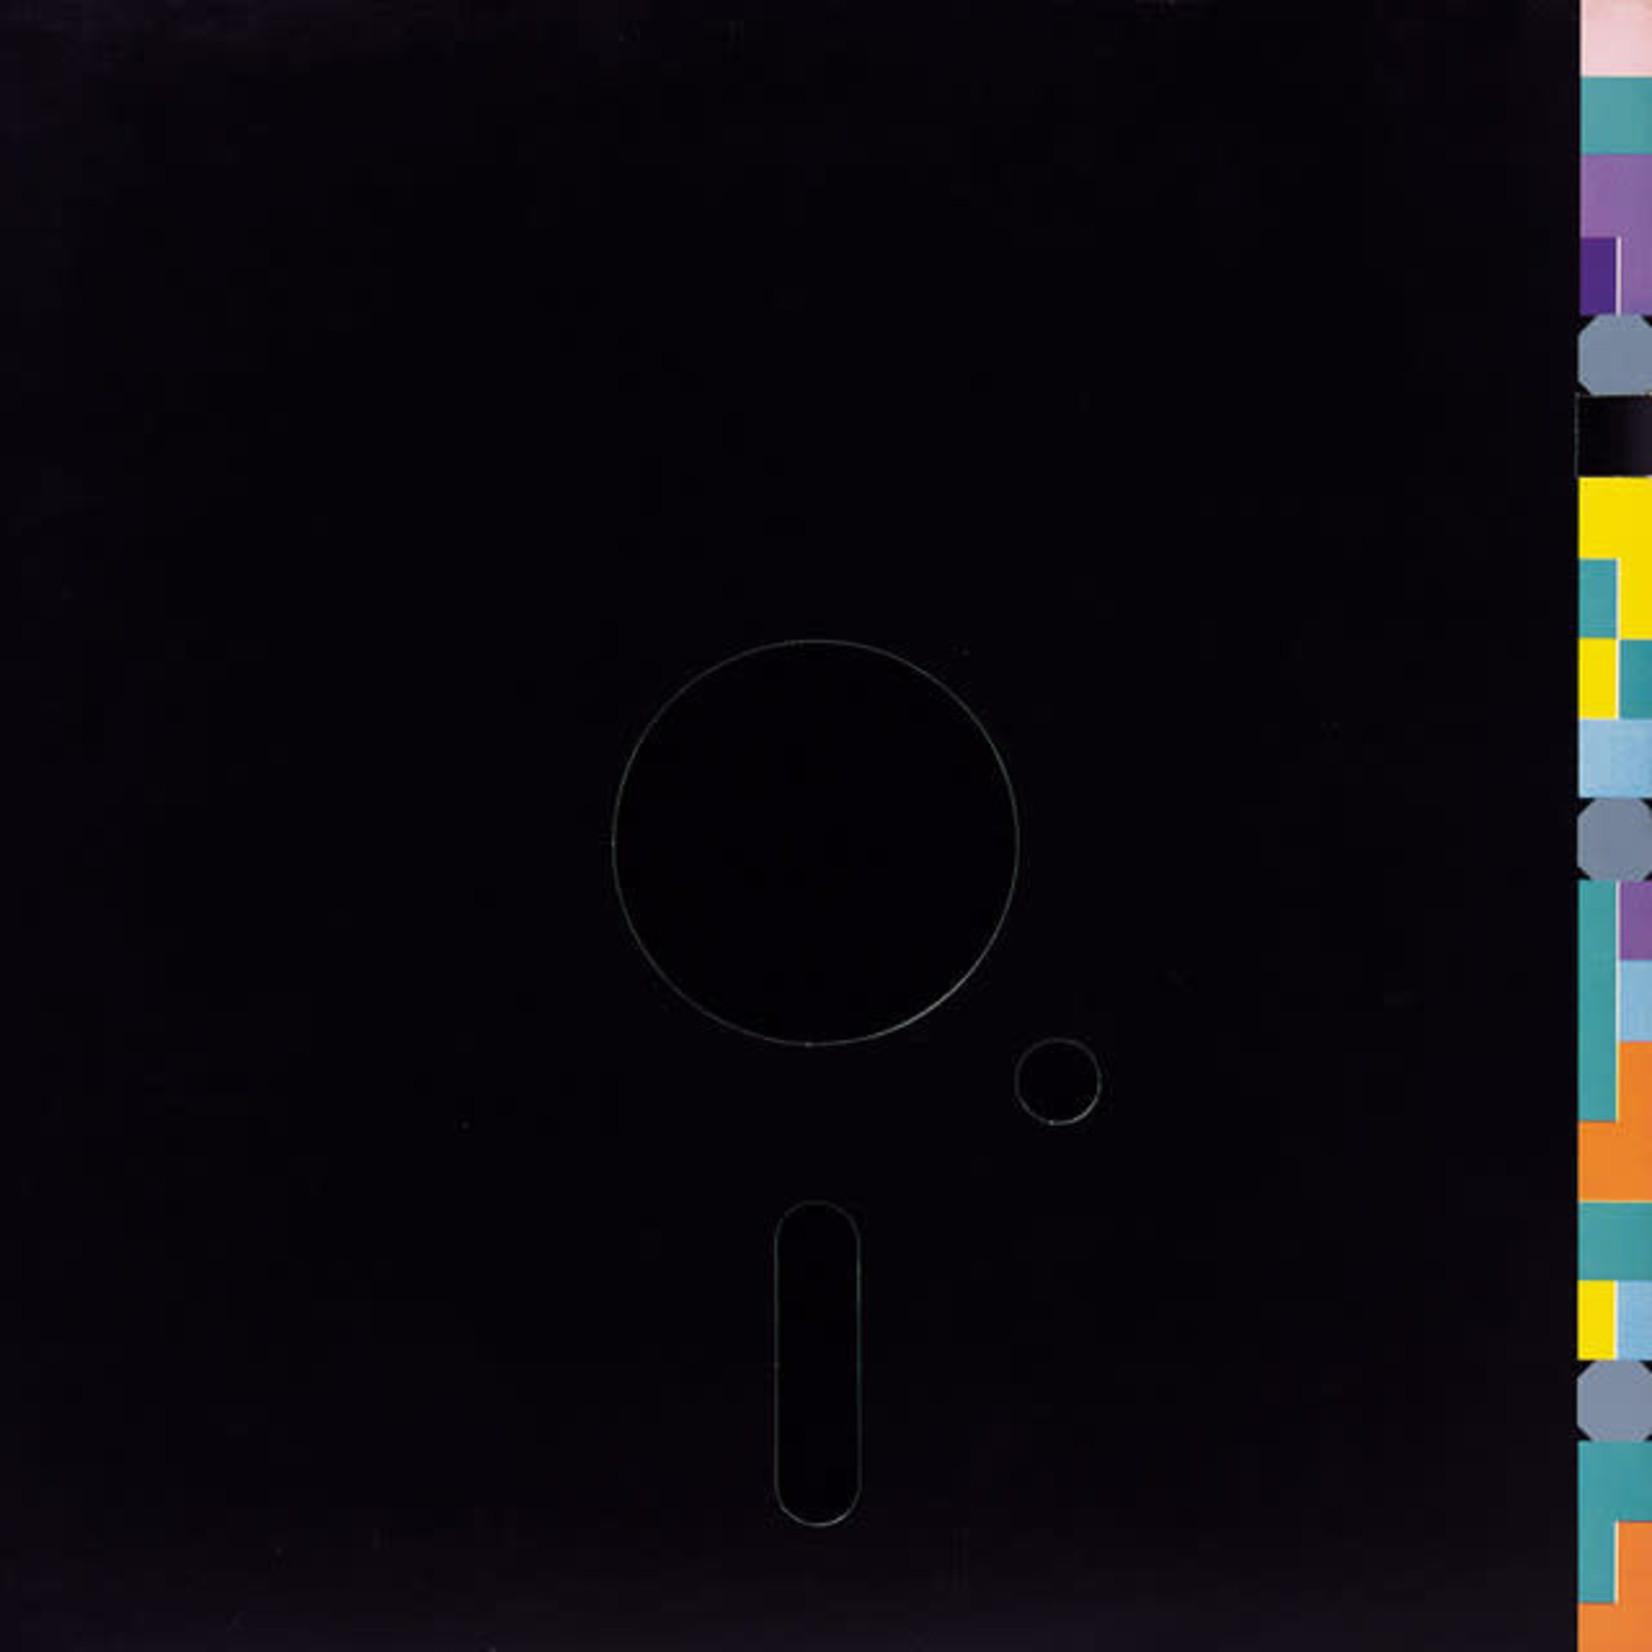 Vinyl New Order - Blue Monday (2020 Remaster)